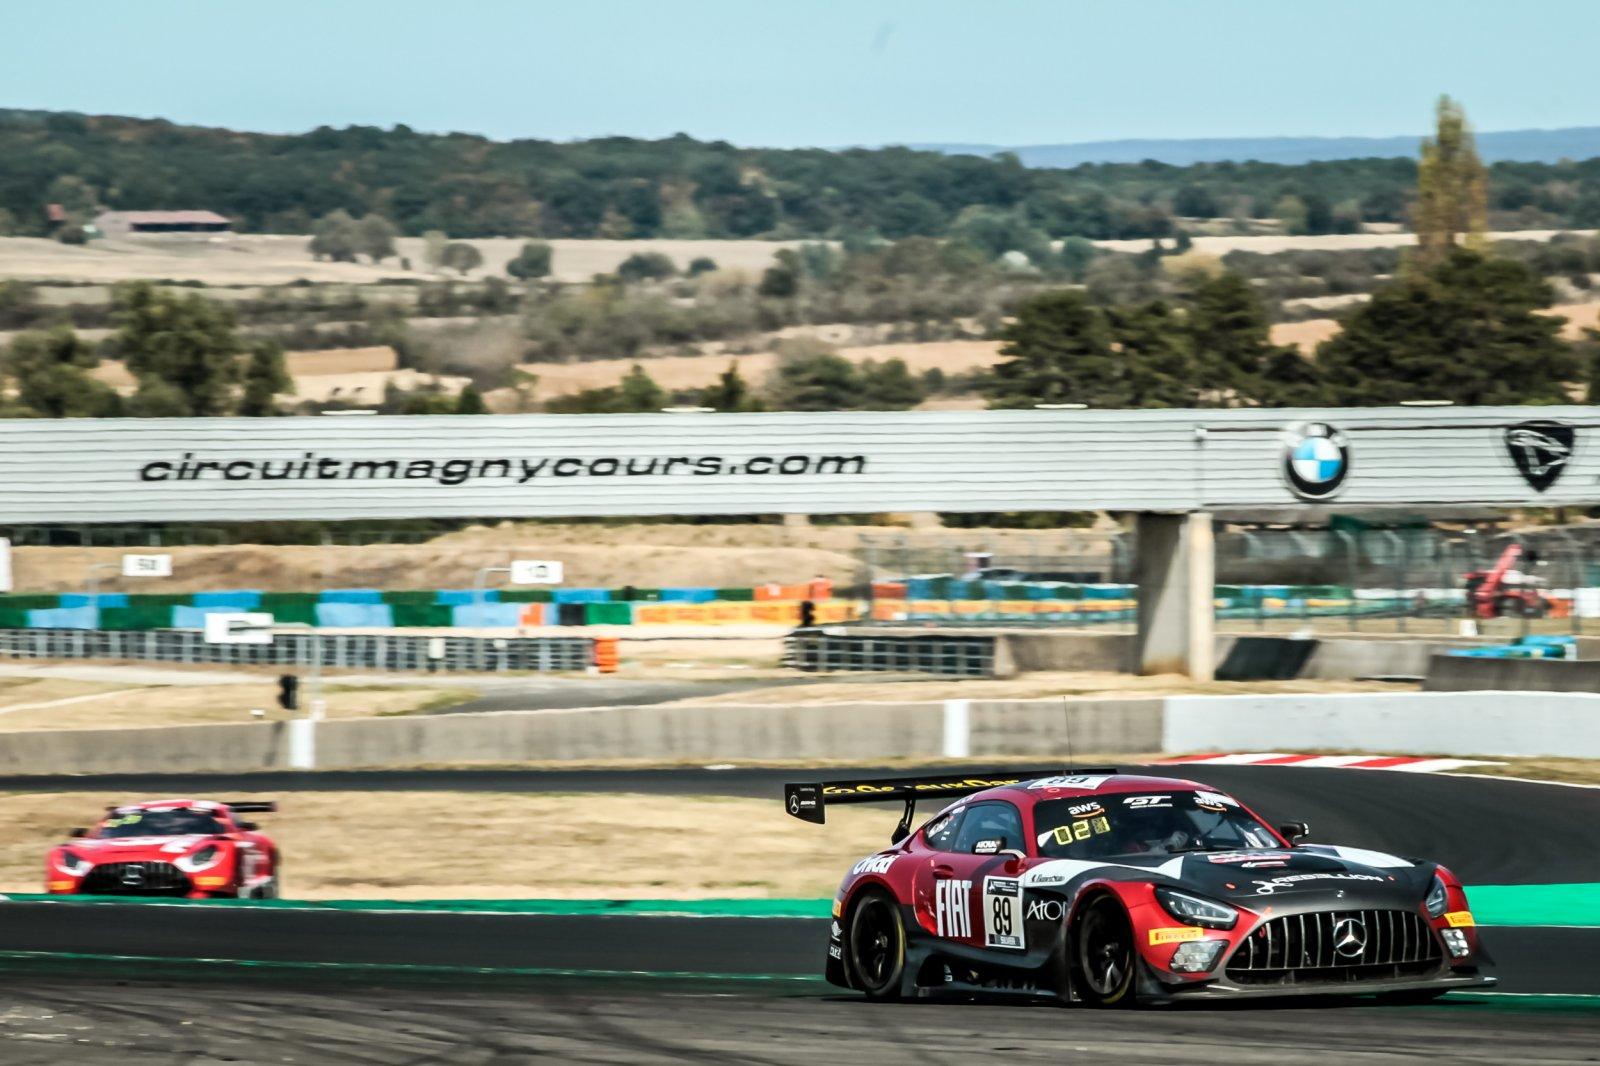 #89 AKKA ASP FRA Mercedes-AMG GT3 Silver Cup Jim Pla FRA Benjamin Hites CHL, Race 2